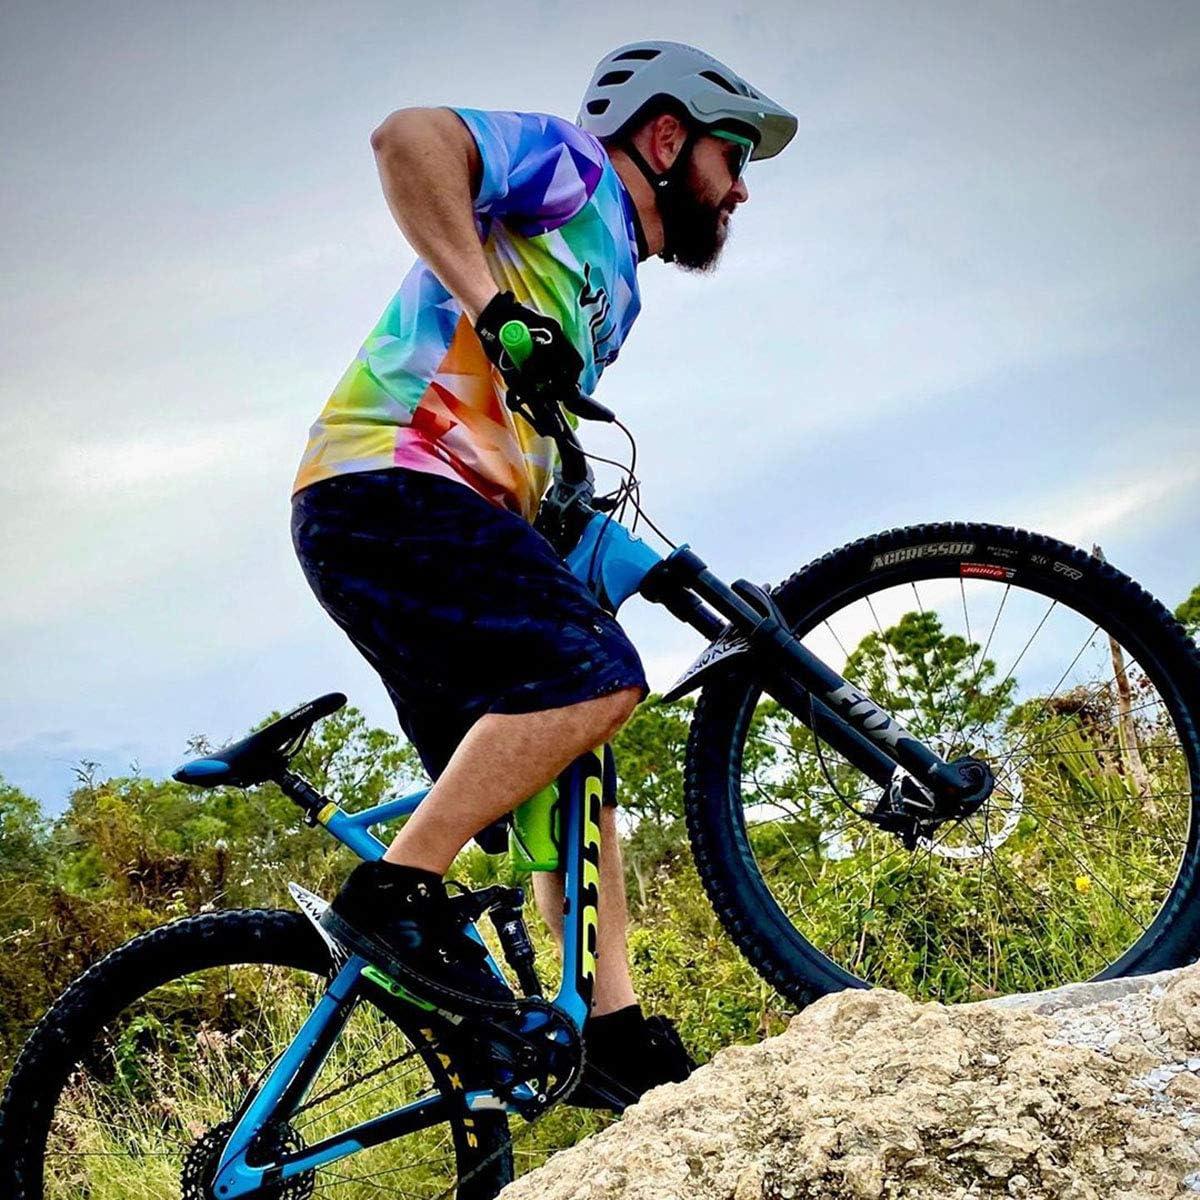 Villain Arrest 1st Offense Bicycle Handlebar Grips for Mountain Bike Enduro Durable Lock-On Bike Grip Trail Trial XC Downhill Ergonomic